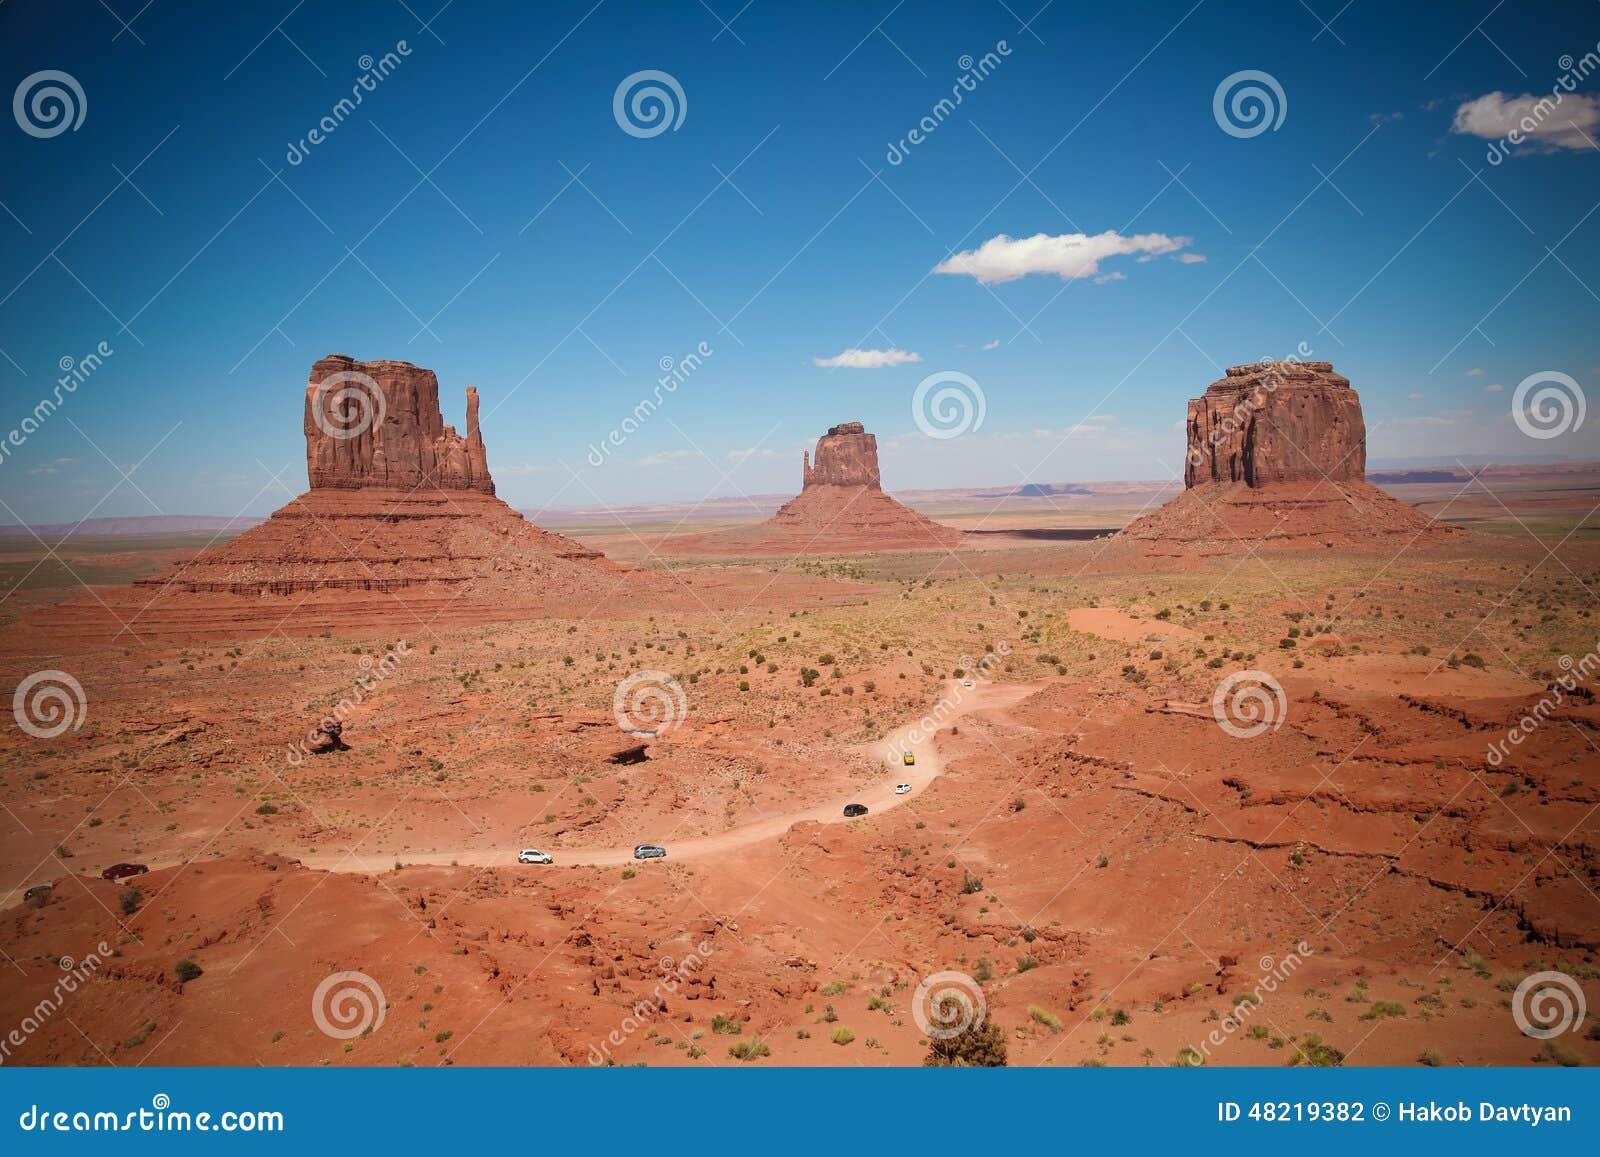 Arizona-/Staat Utah-Linie